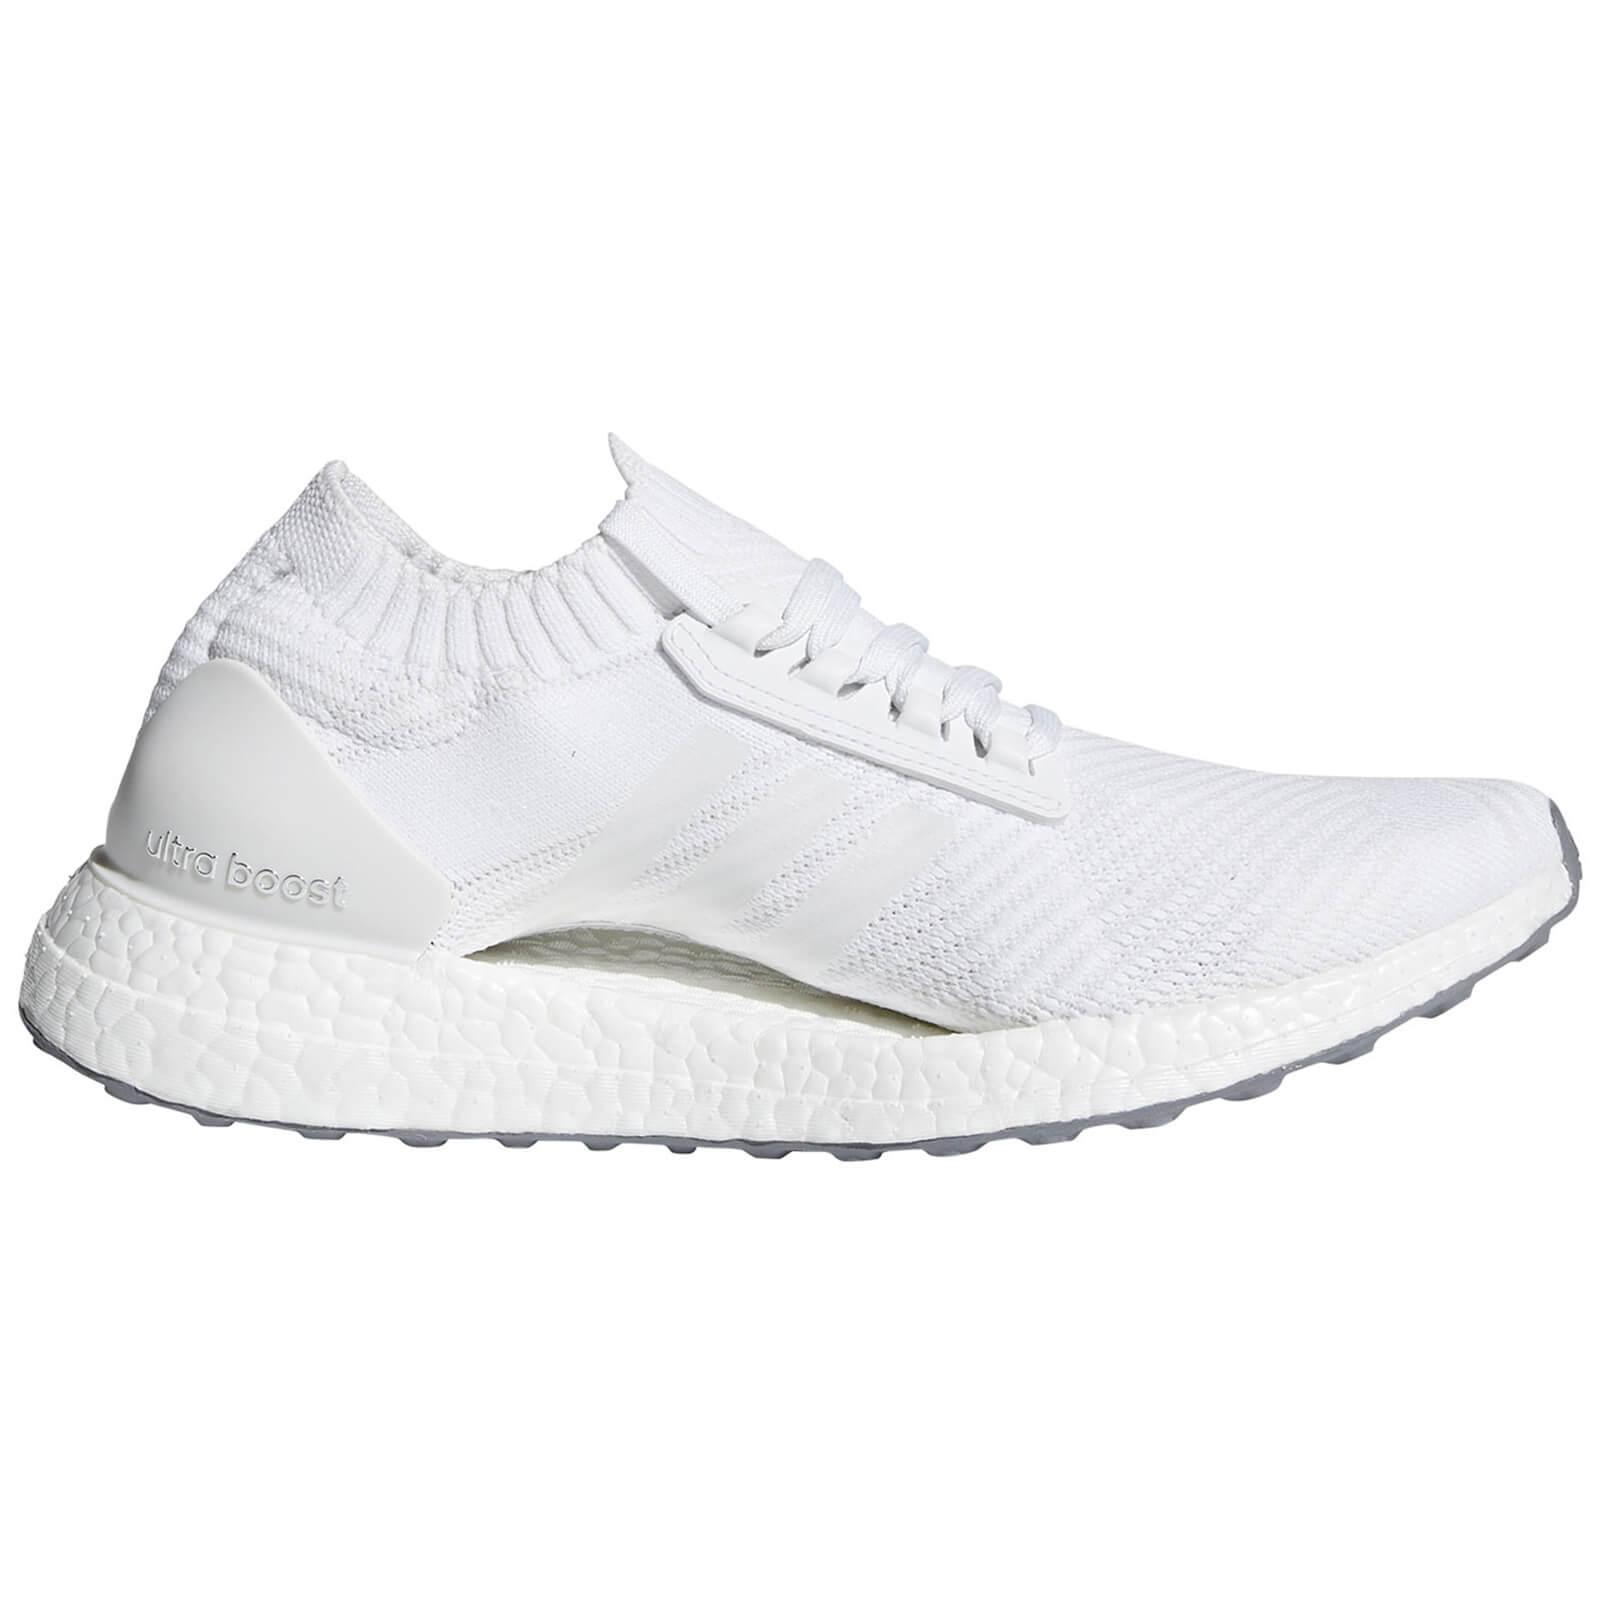 adidas Women's Ultraboost X Running Shoes - White - US 6.5/UK 5 - White